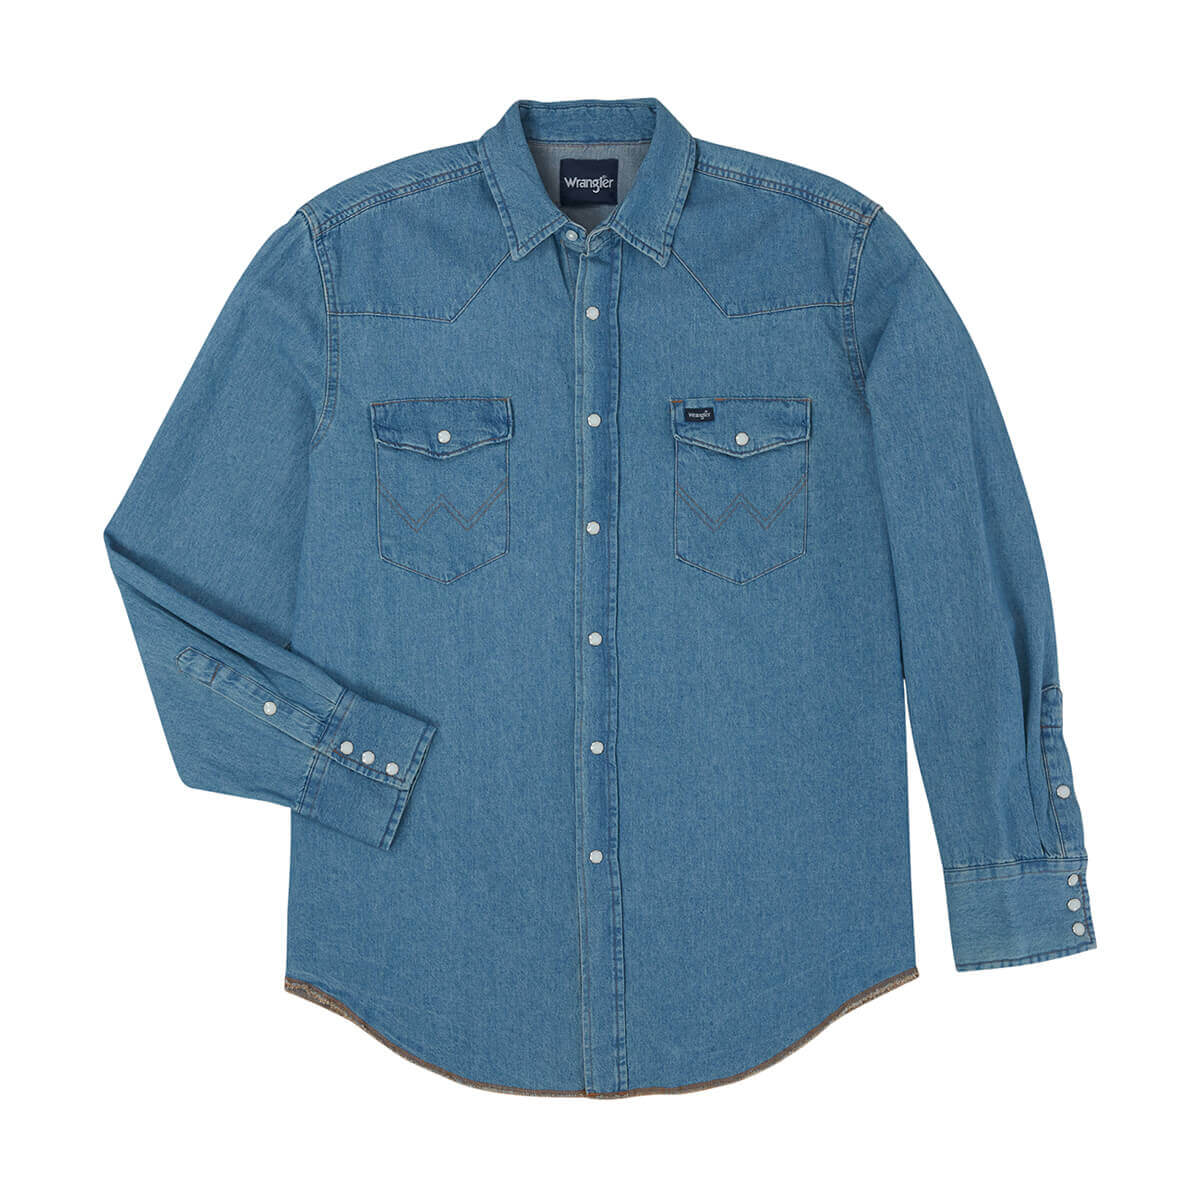 Wranglers - Men's Stonewash Denim Work Shirt - XL